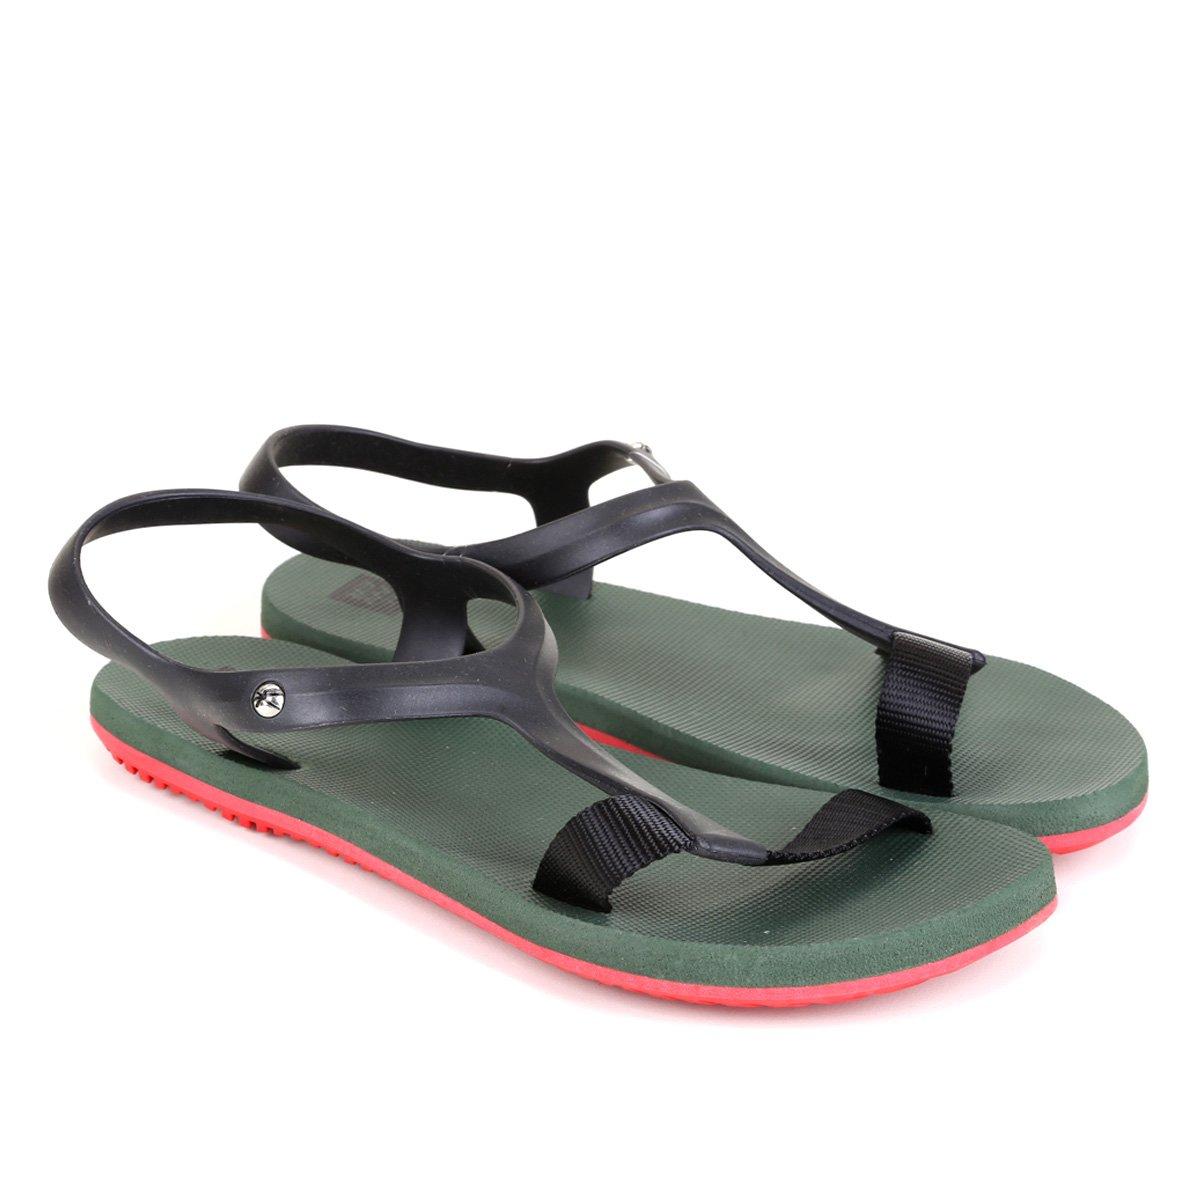 Chinelo Kenner Sandal Mixed Feminino